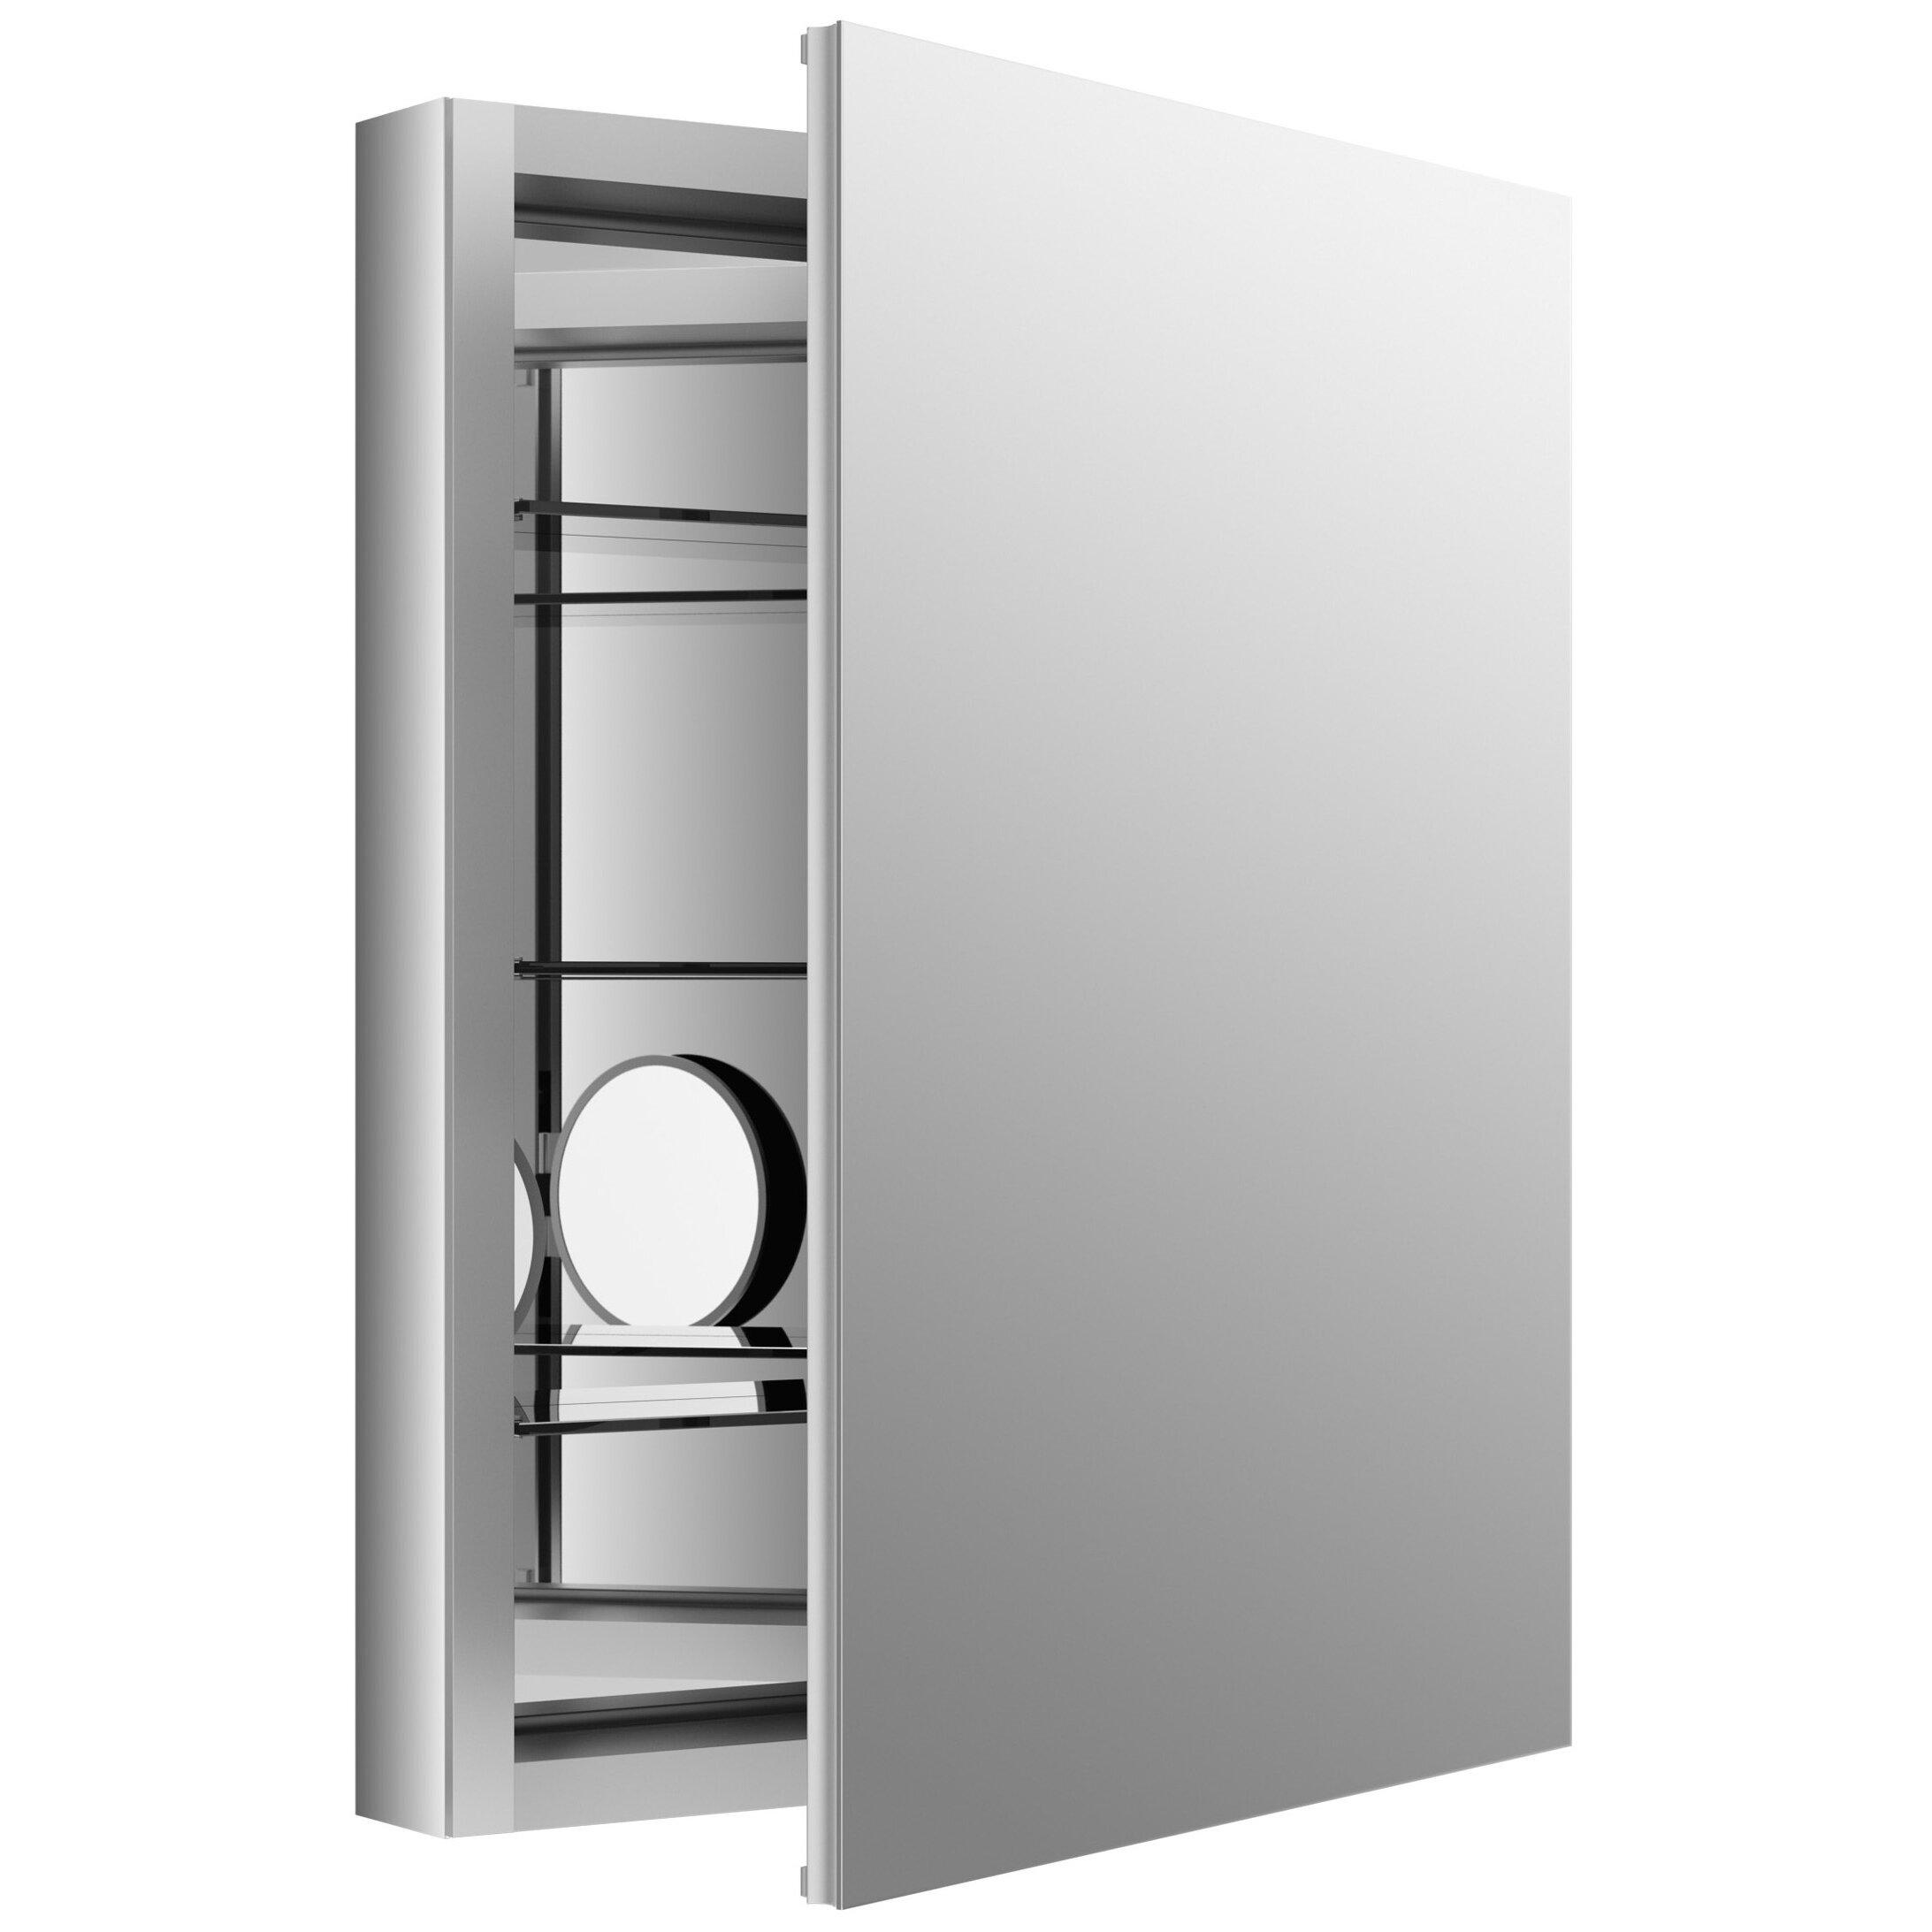 24 X 36 Medicine Cabinet Kohler Verdera 24 W X 30 H Medicine Cabinet With Adjustable